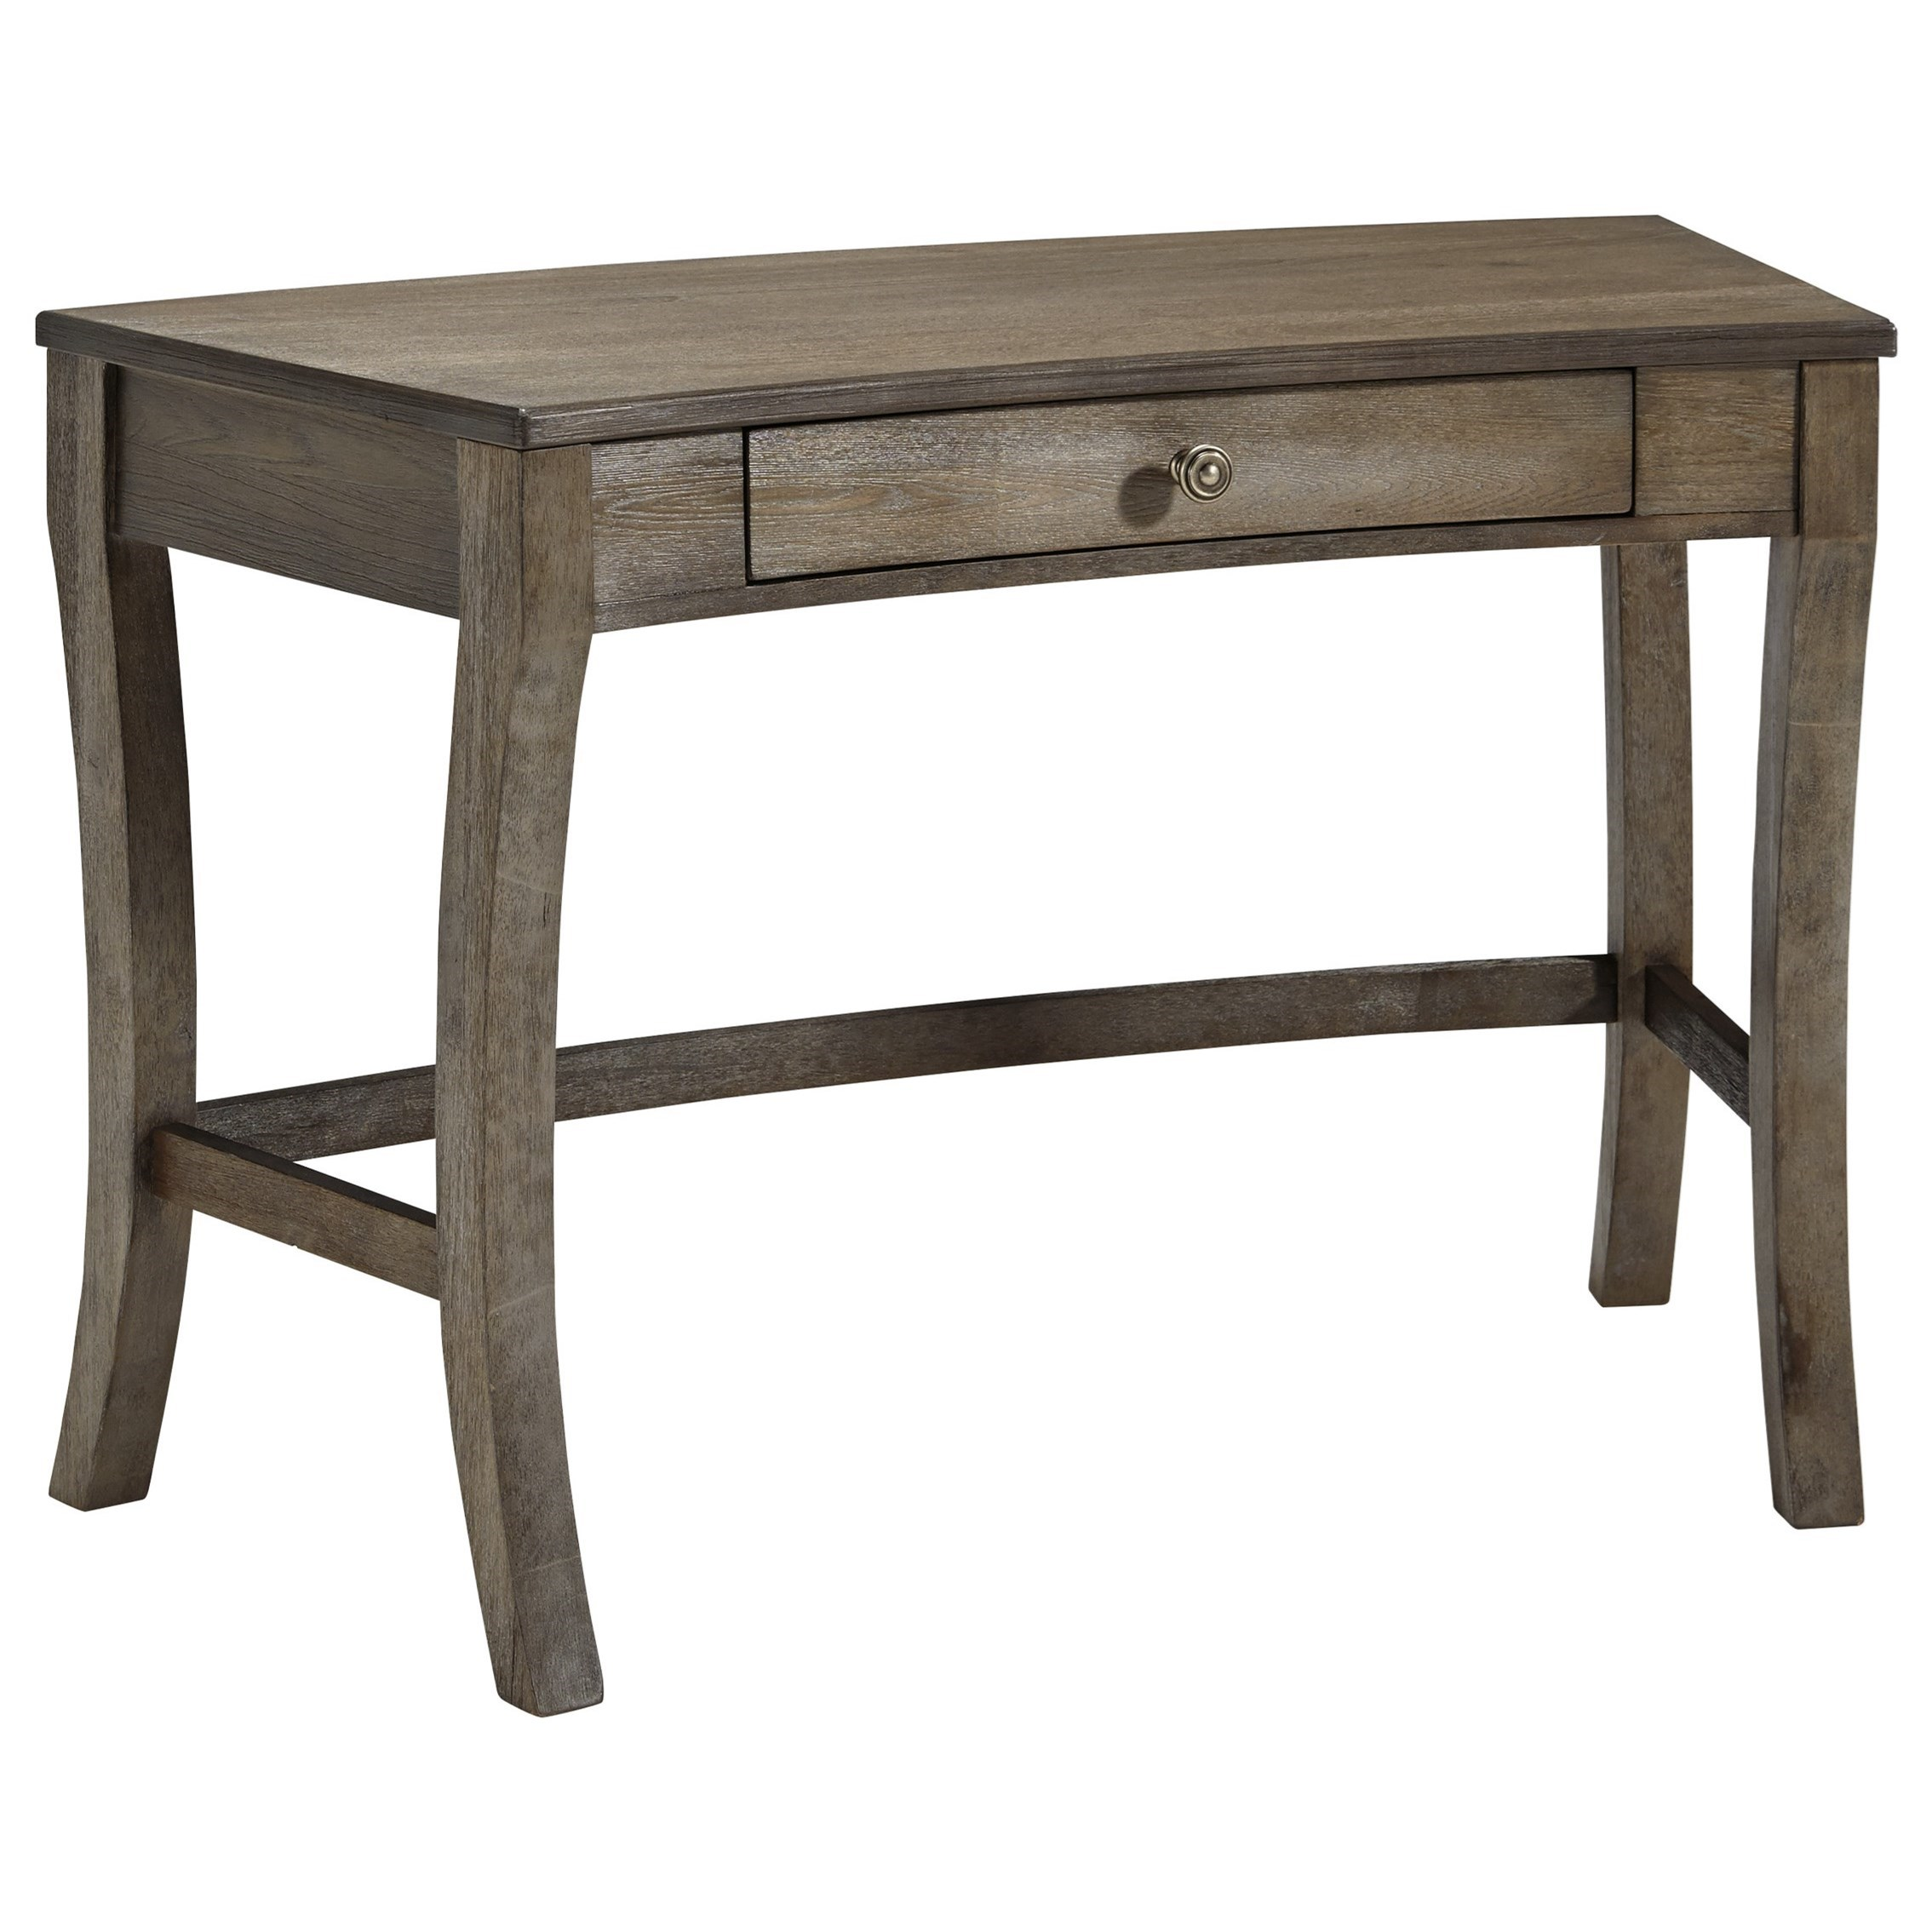 Signature Design by Ashley Vintelli Home Office Desk - Item Number: H316-10